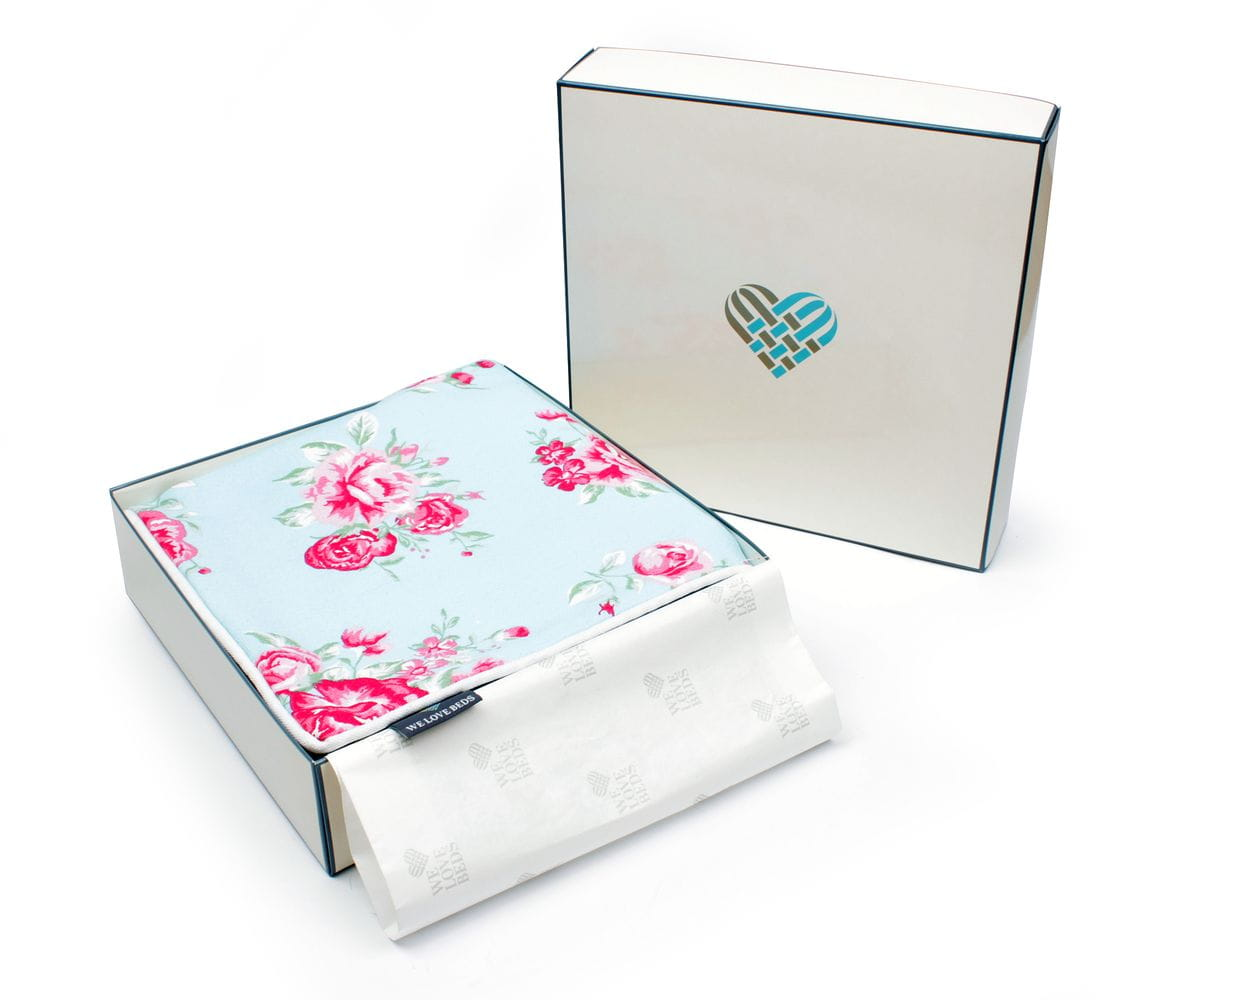 Poduszka dekoracyjna Roses Blue 40x60 cm - We Love Candles&We Love Beds